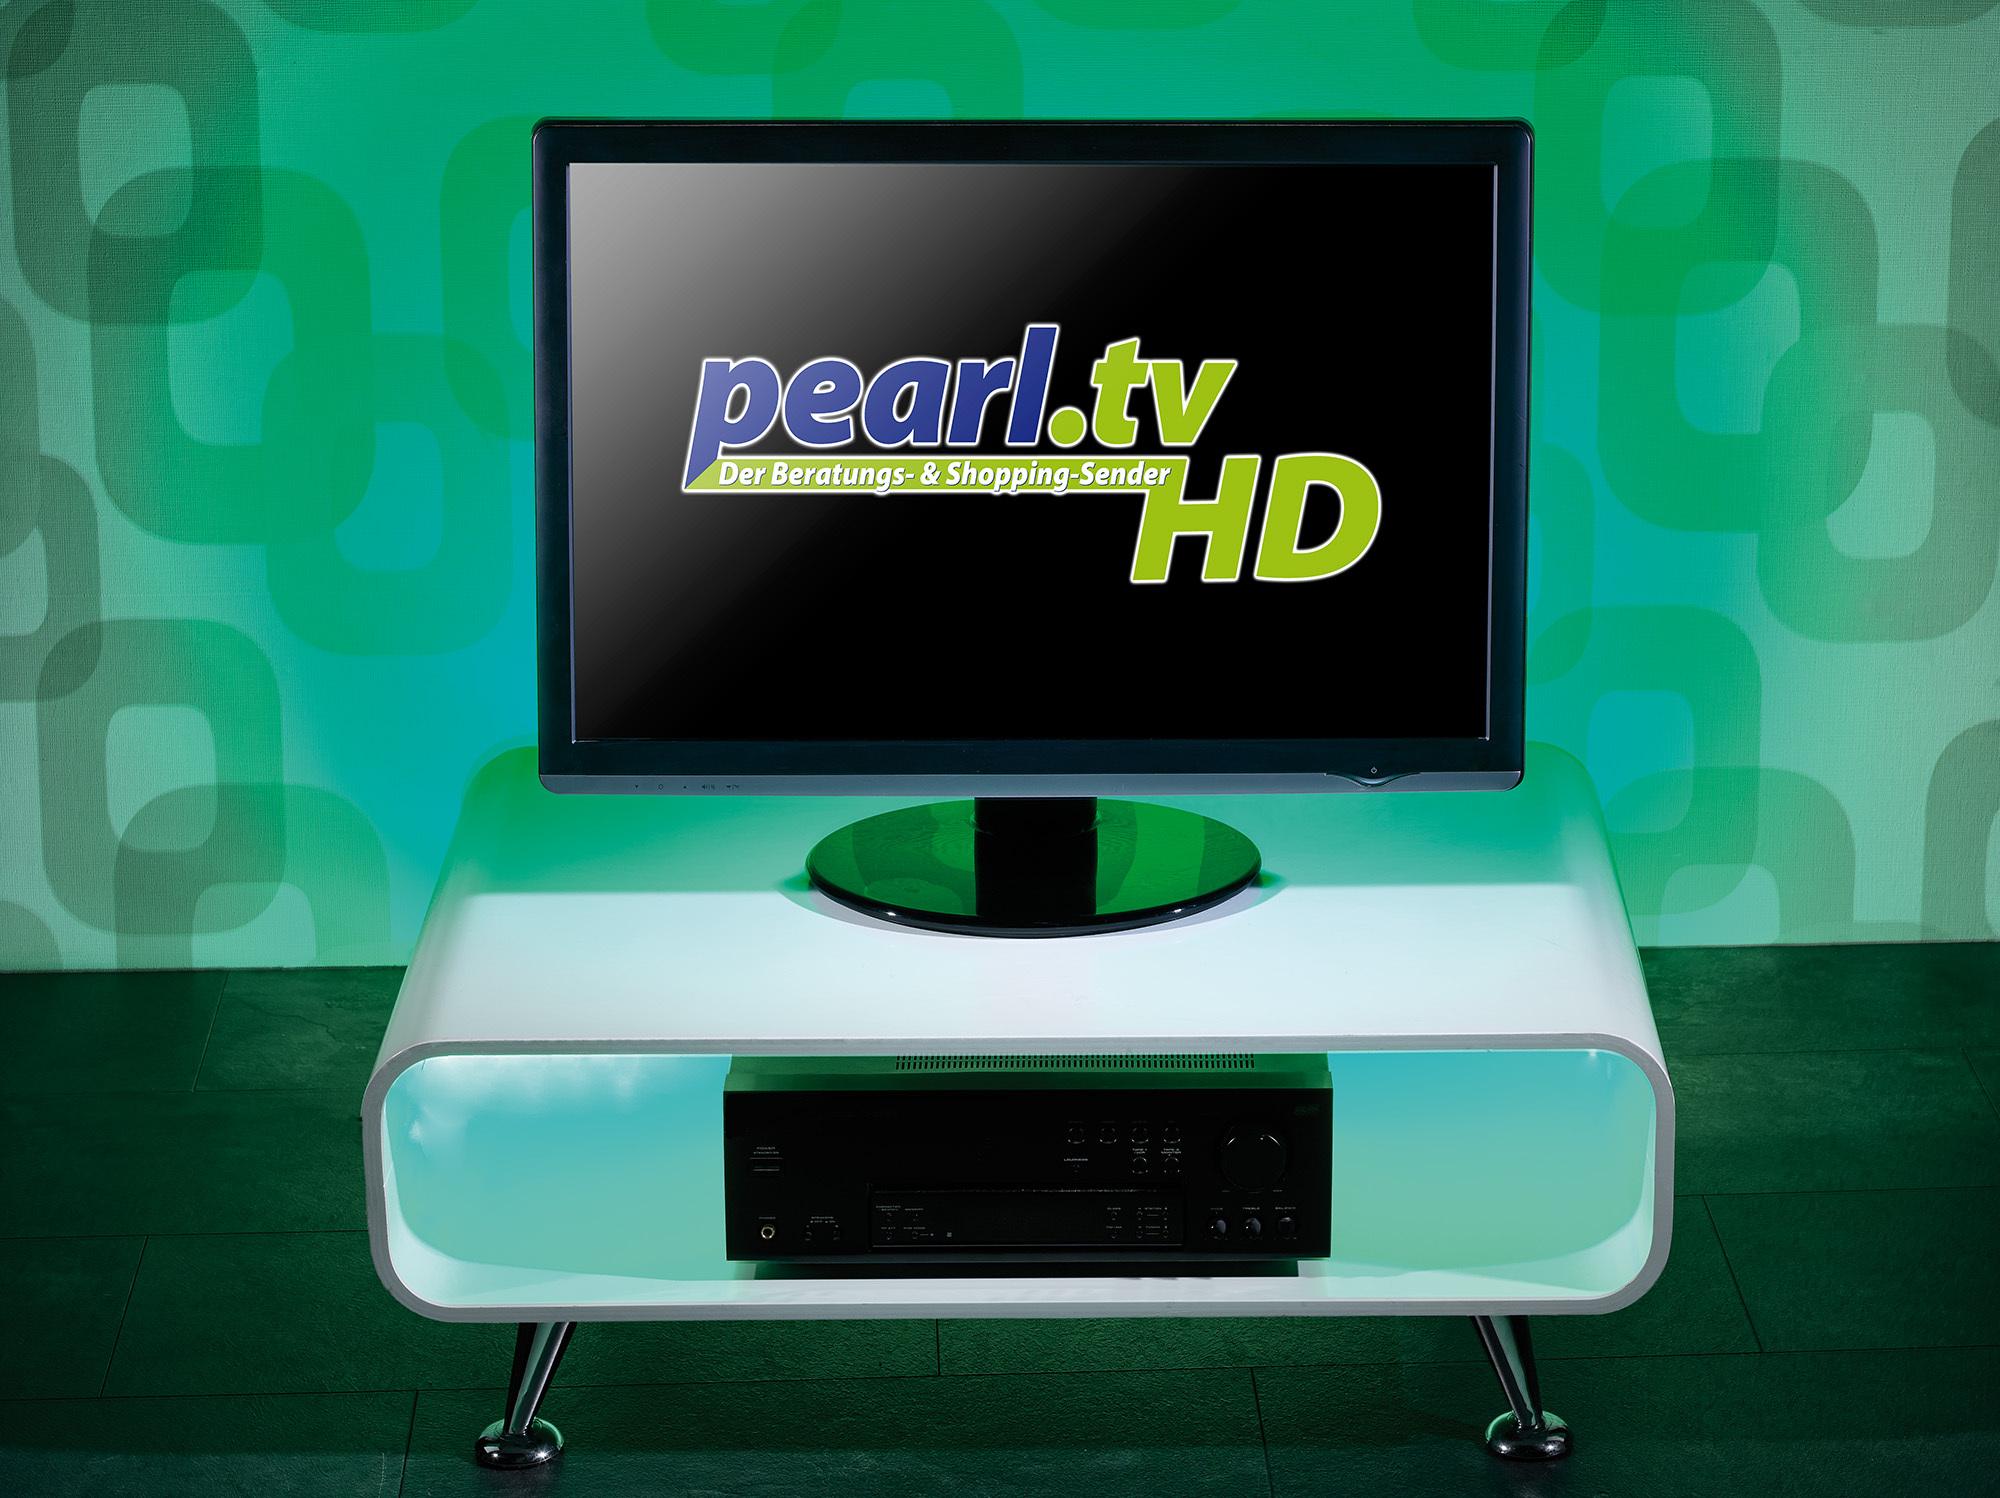 lunartec tv hintergrundbeleuchtung mit usb wei oder multicolor f r 24 44 bzw 46 70 foto. Black Bedroom Furniture Sets. Home Design Ideas